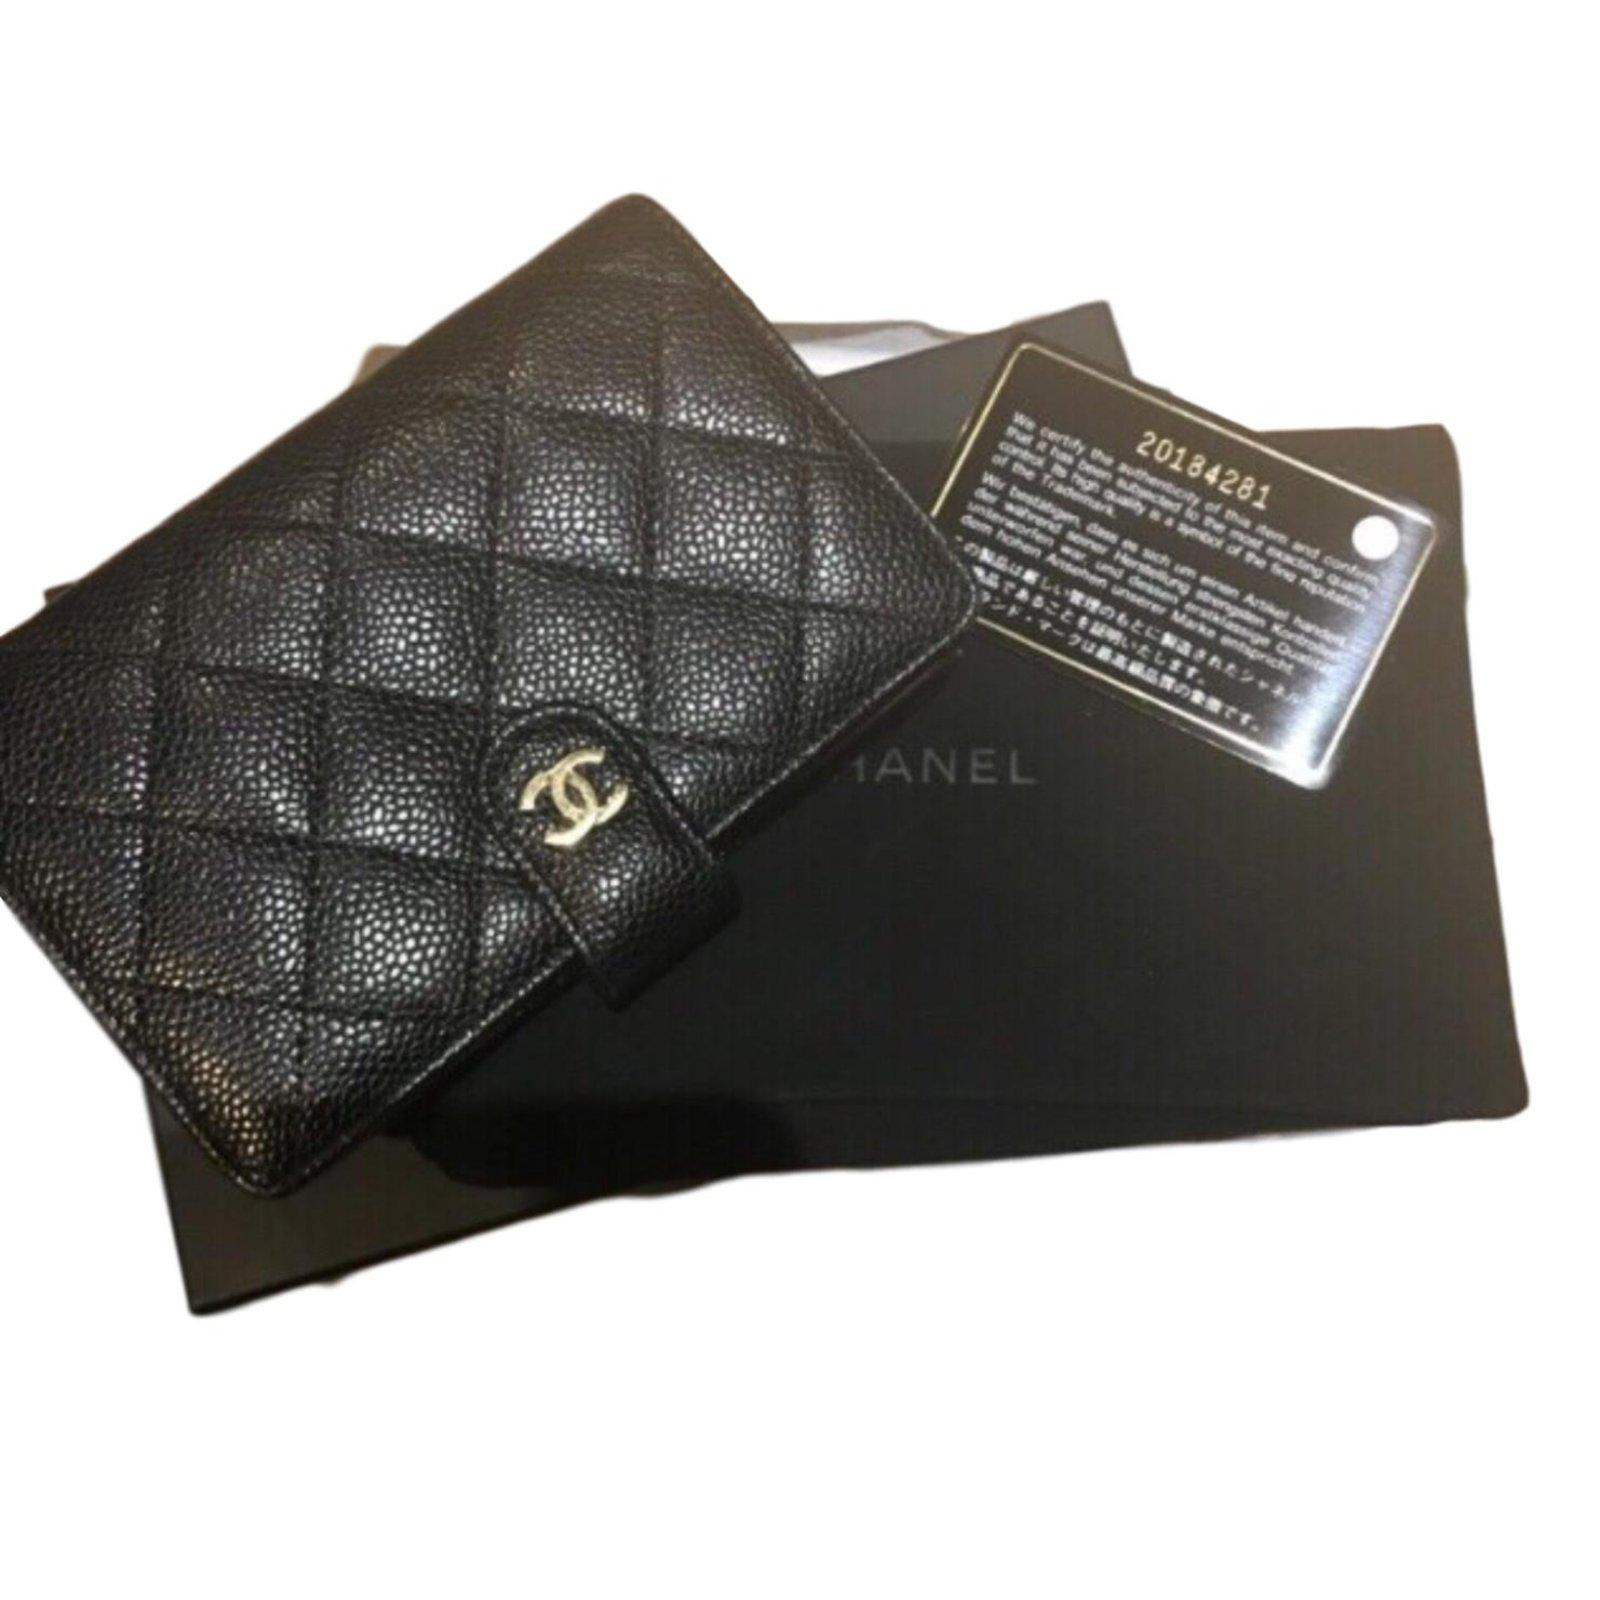 adf327e997a7 Portefeuilles Chanel Classique Caviar cc Cuir Noir ref.63691 - Joli ...